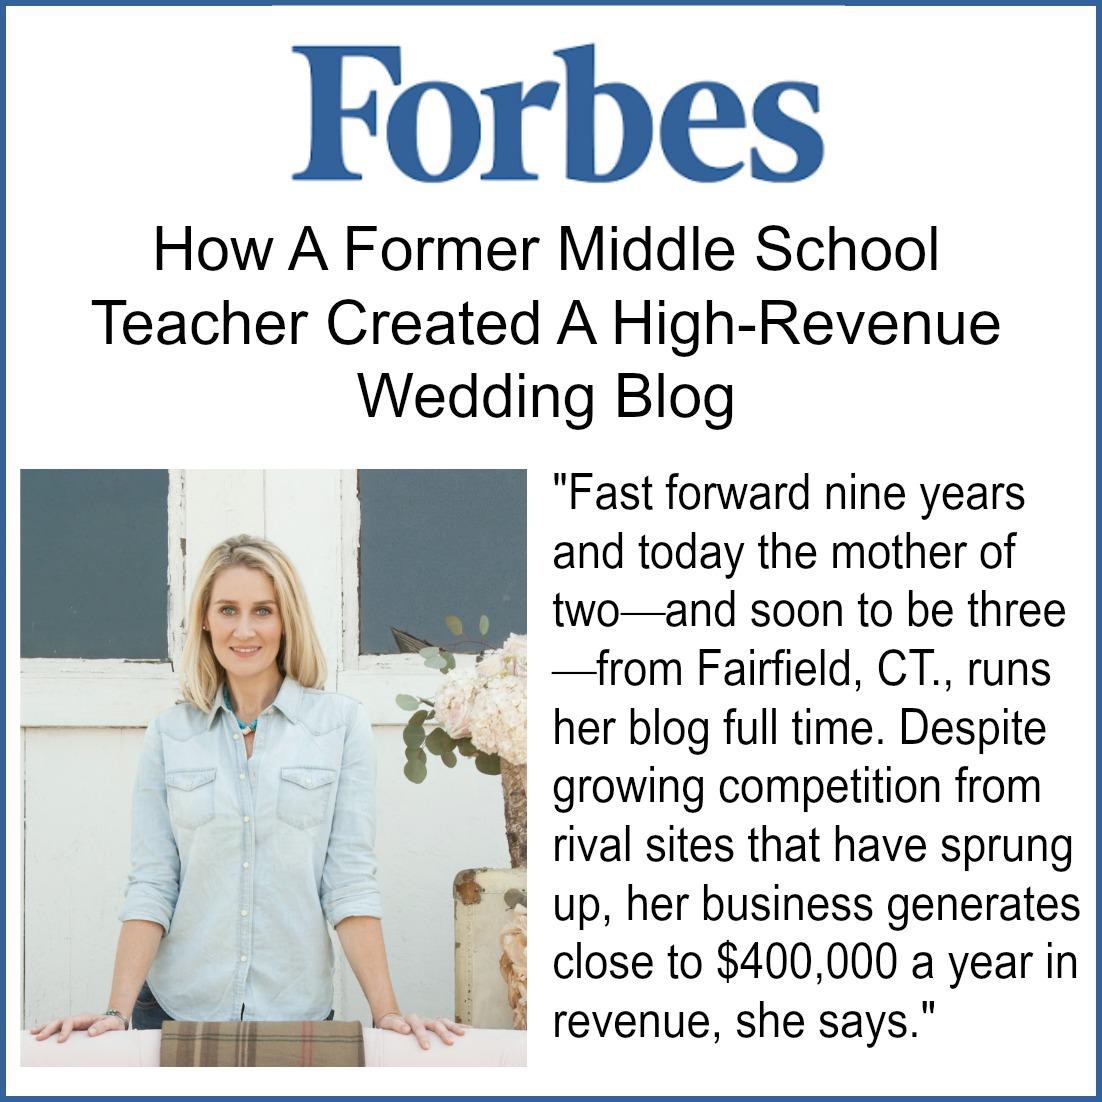 Forbes -  How A Former Middle School Teacher Created A High-Revenue Wedding Blog